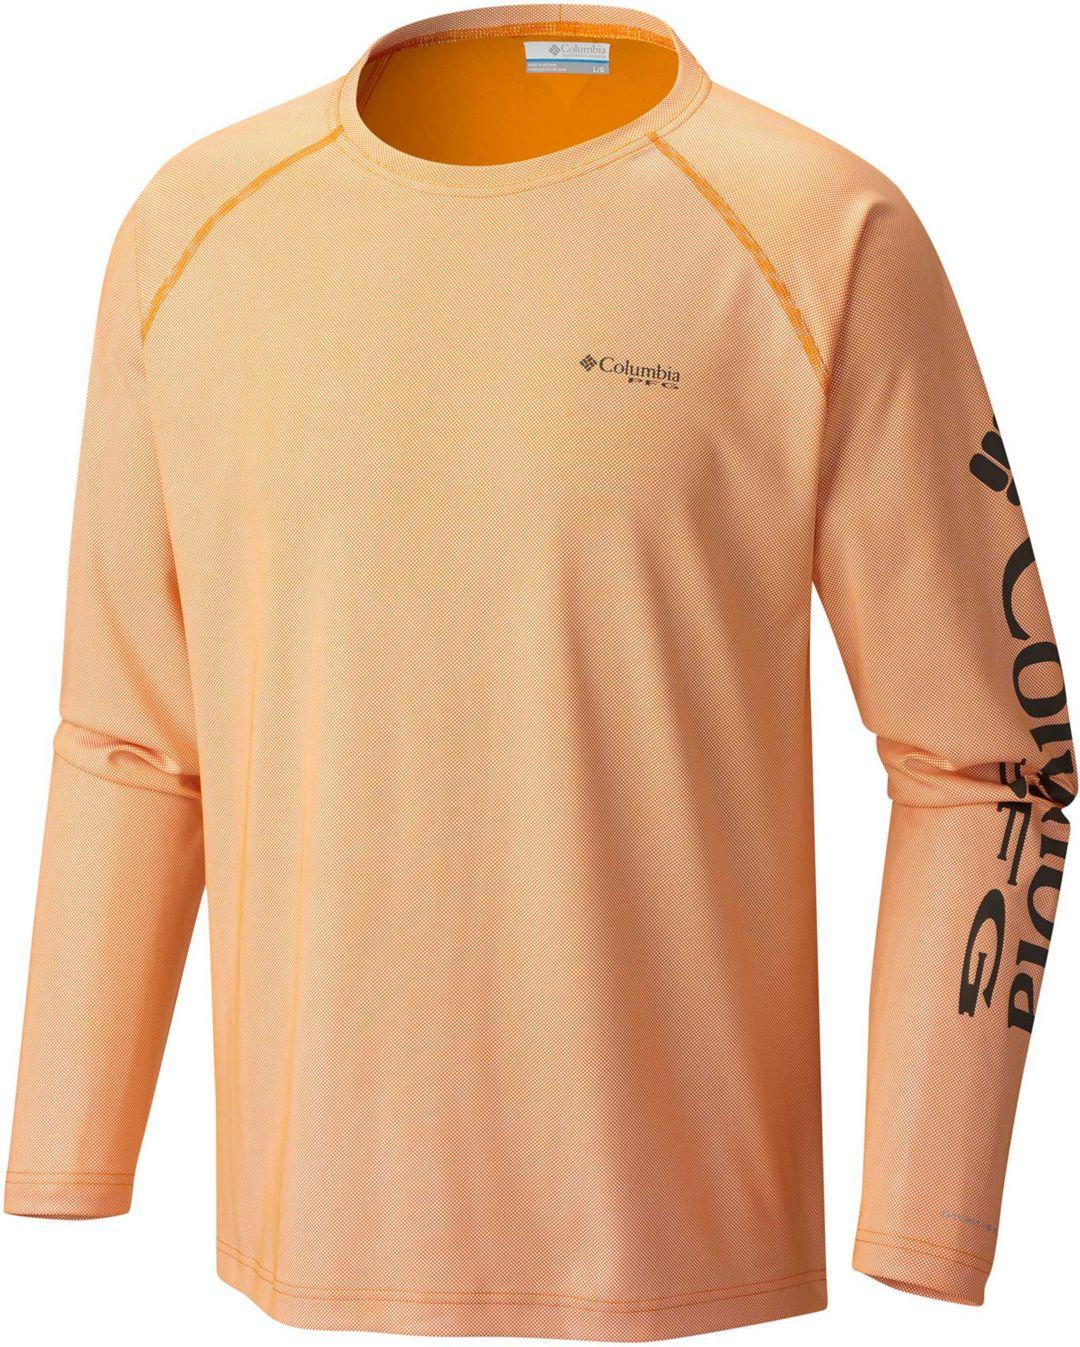 41a2519ec0f Columbia Men's PFG Solar Shade Long Sleeve Shirt | DICK'S Sporting Goods